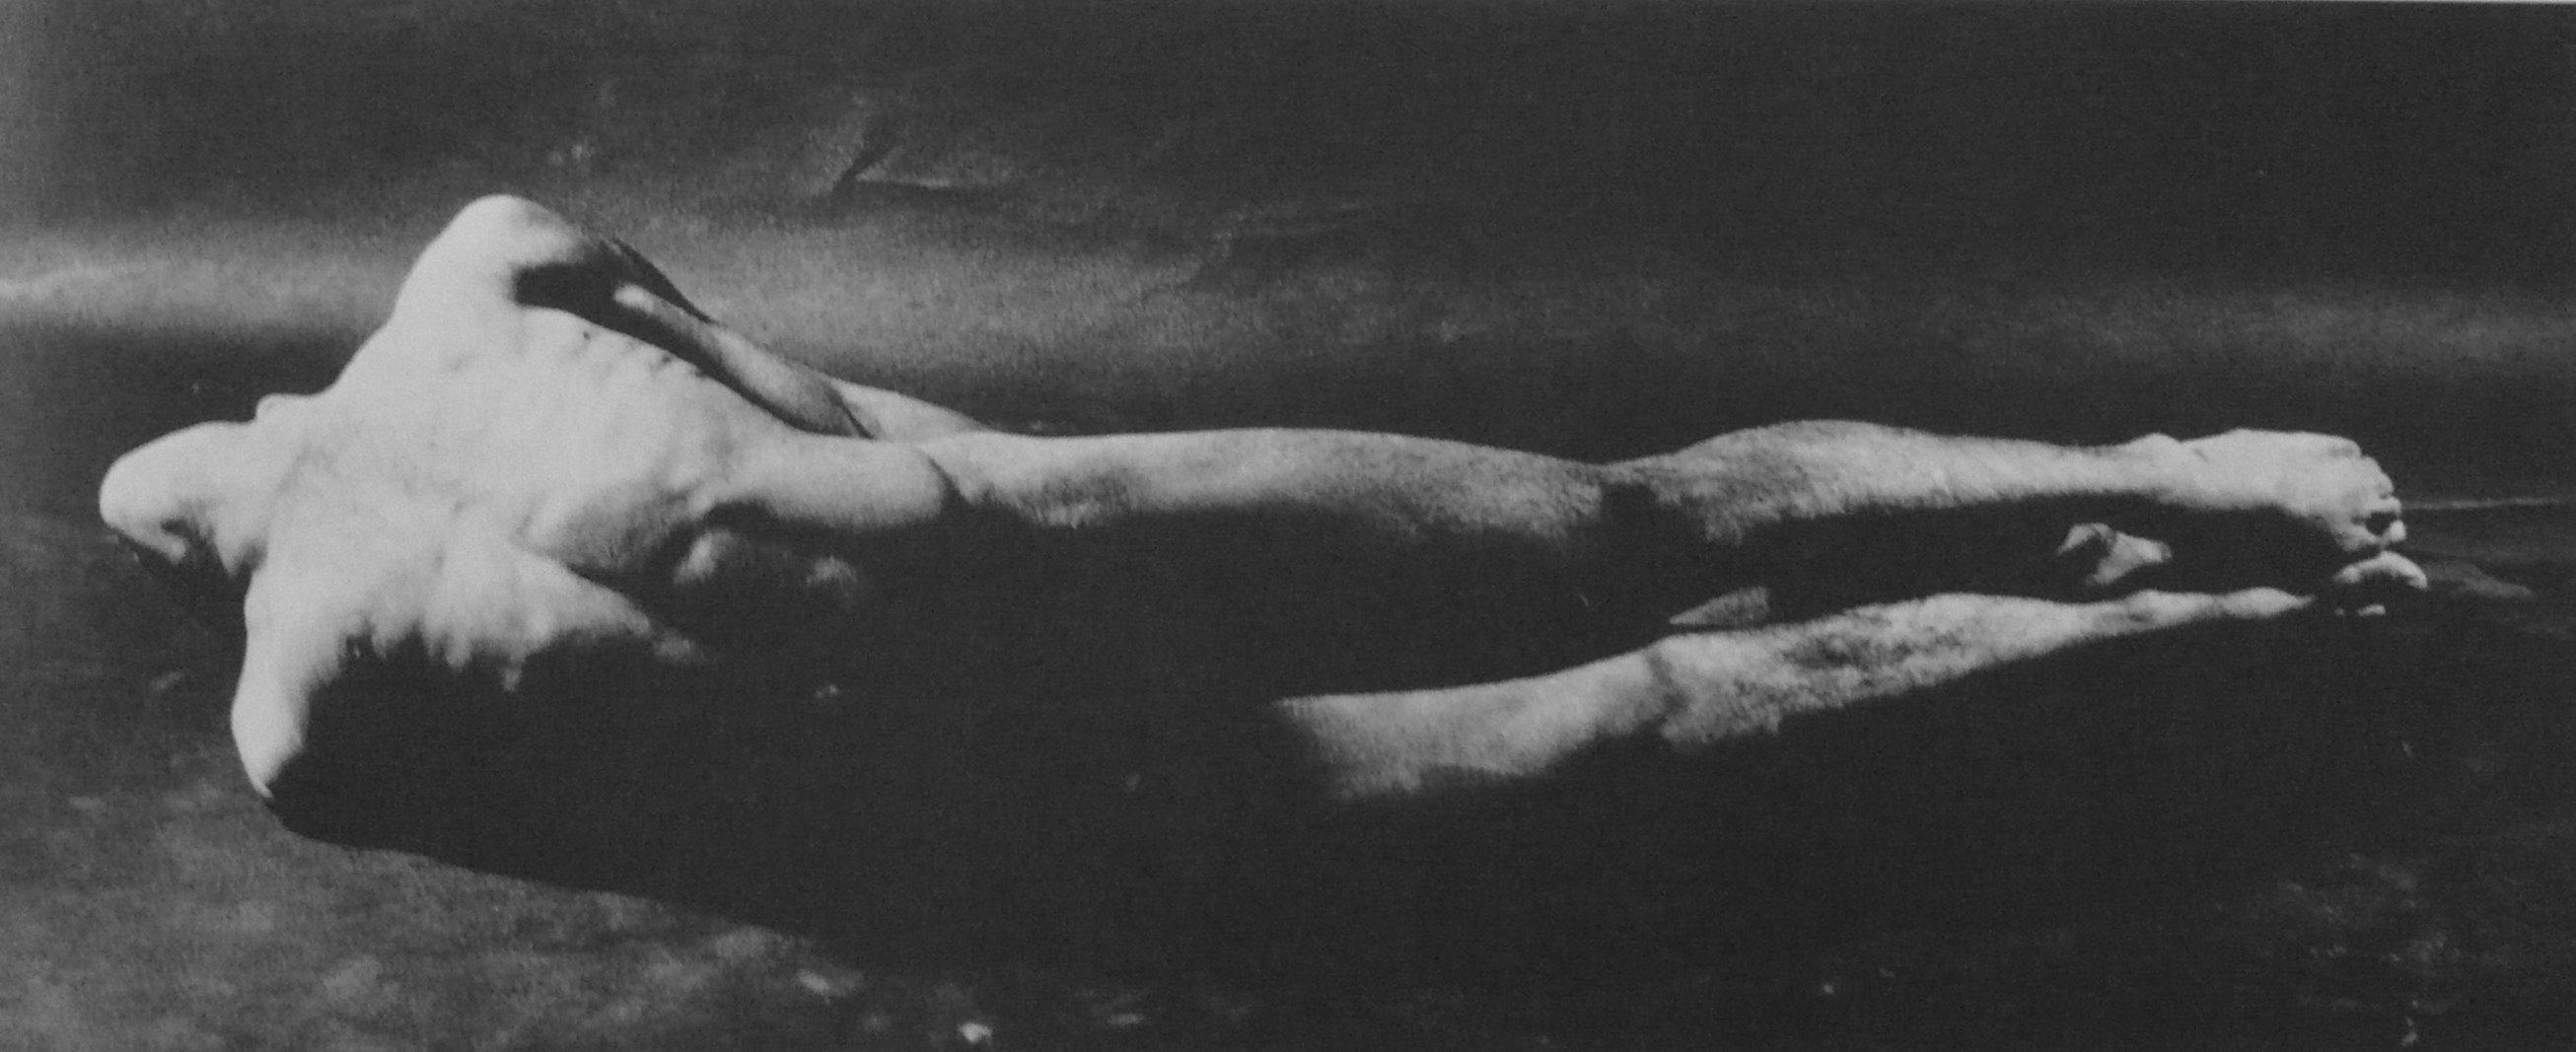 Somnier deus #30 (1991) - Toni Catany